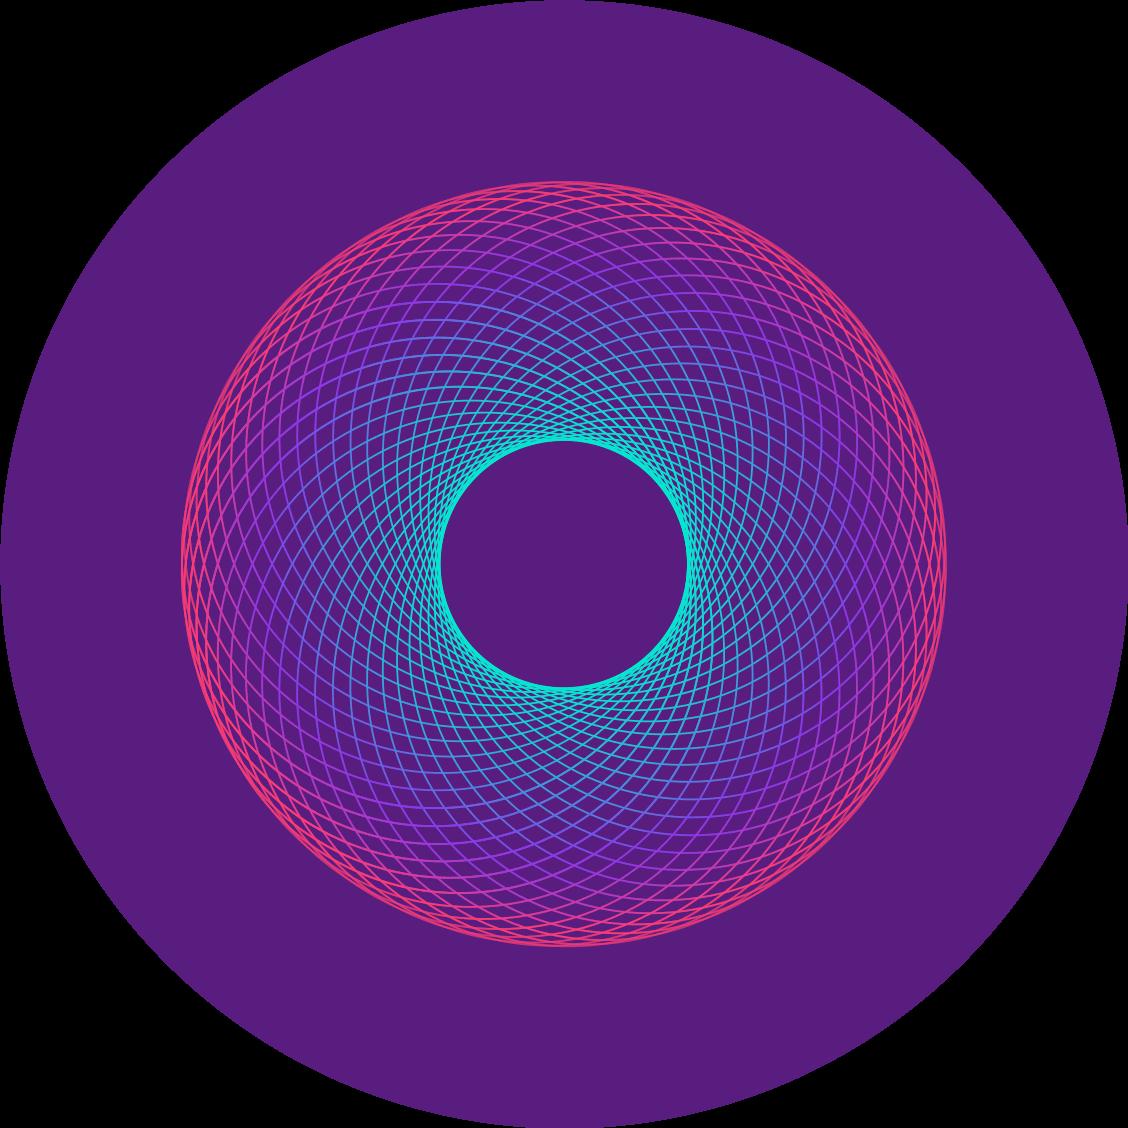 Vortex decorative shape